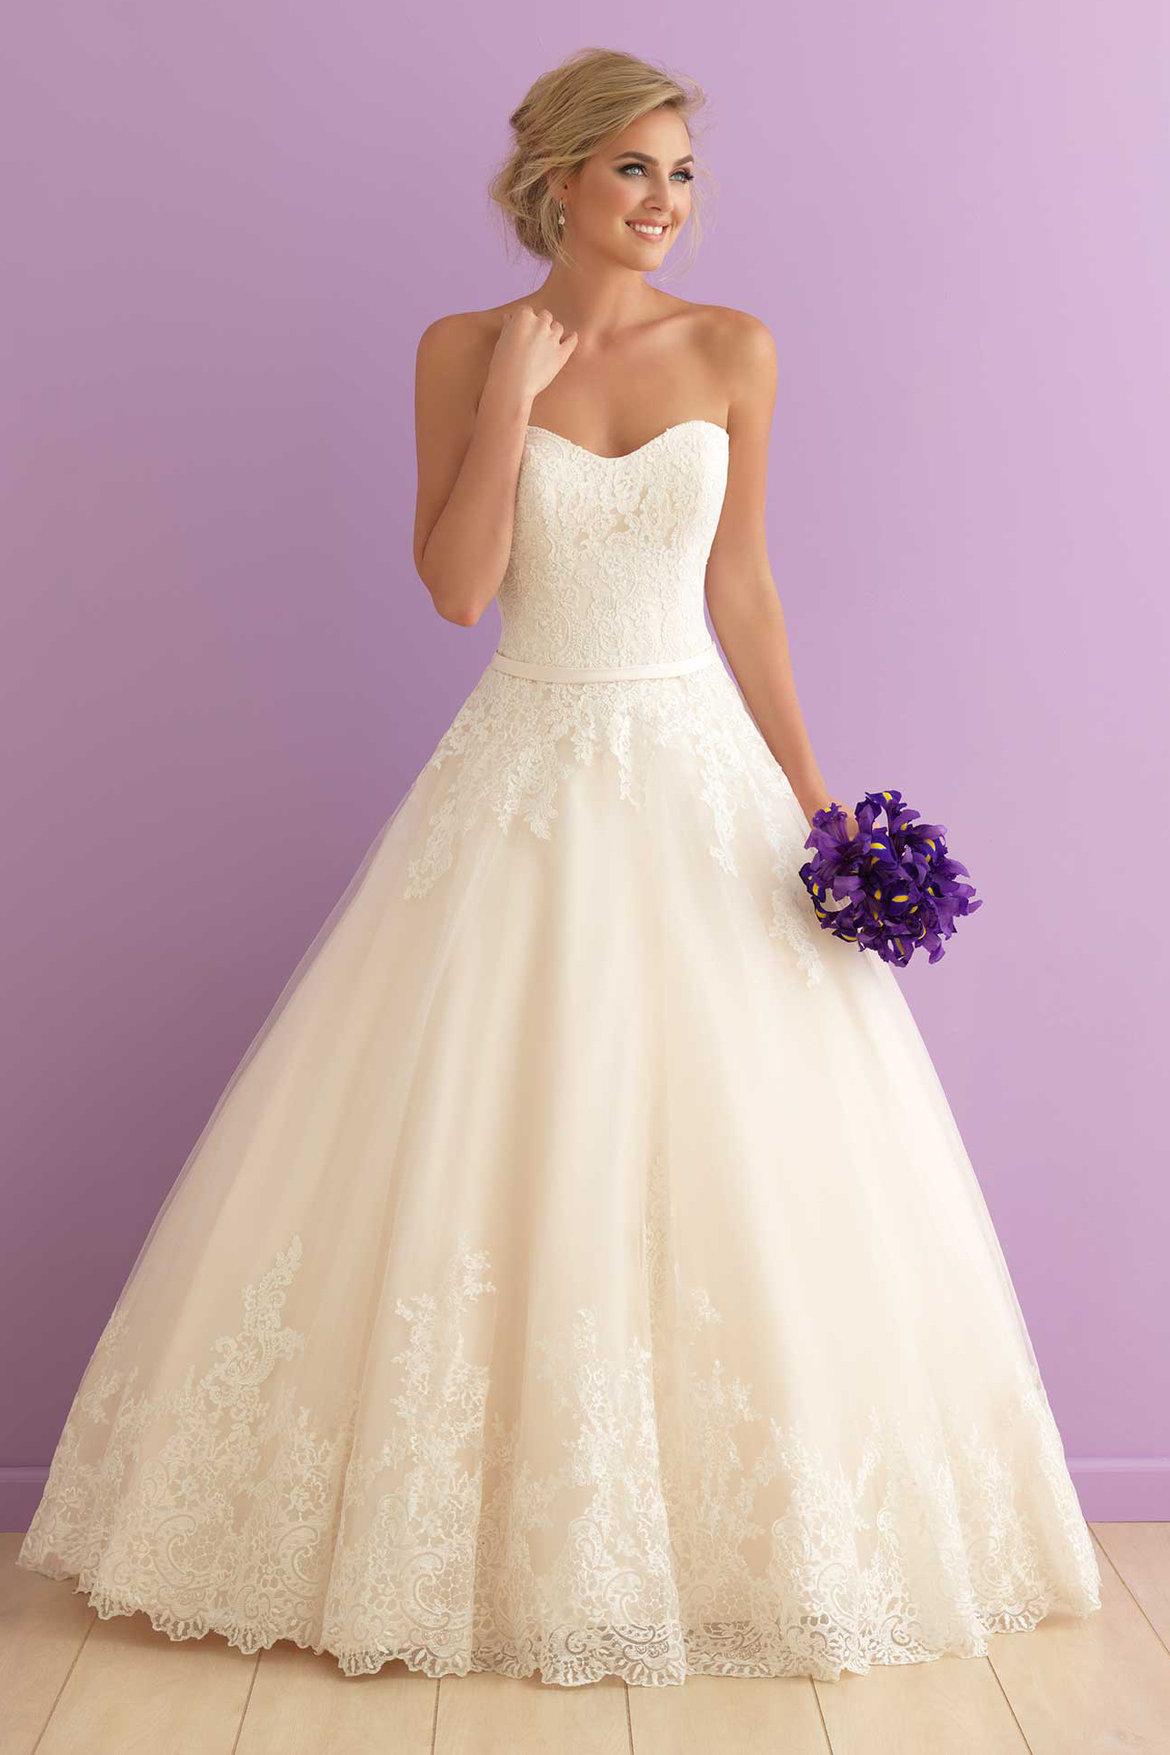 27 allure romance - Top Wedding Dresses